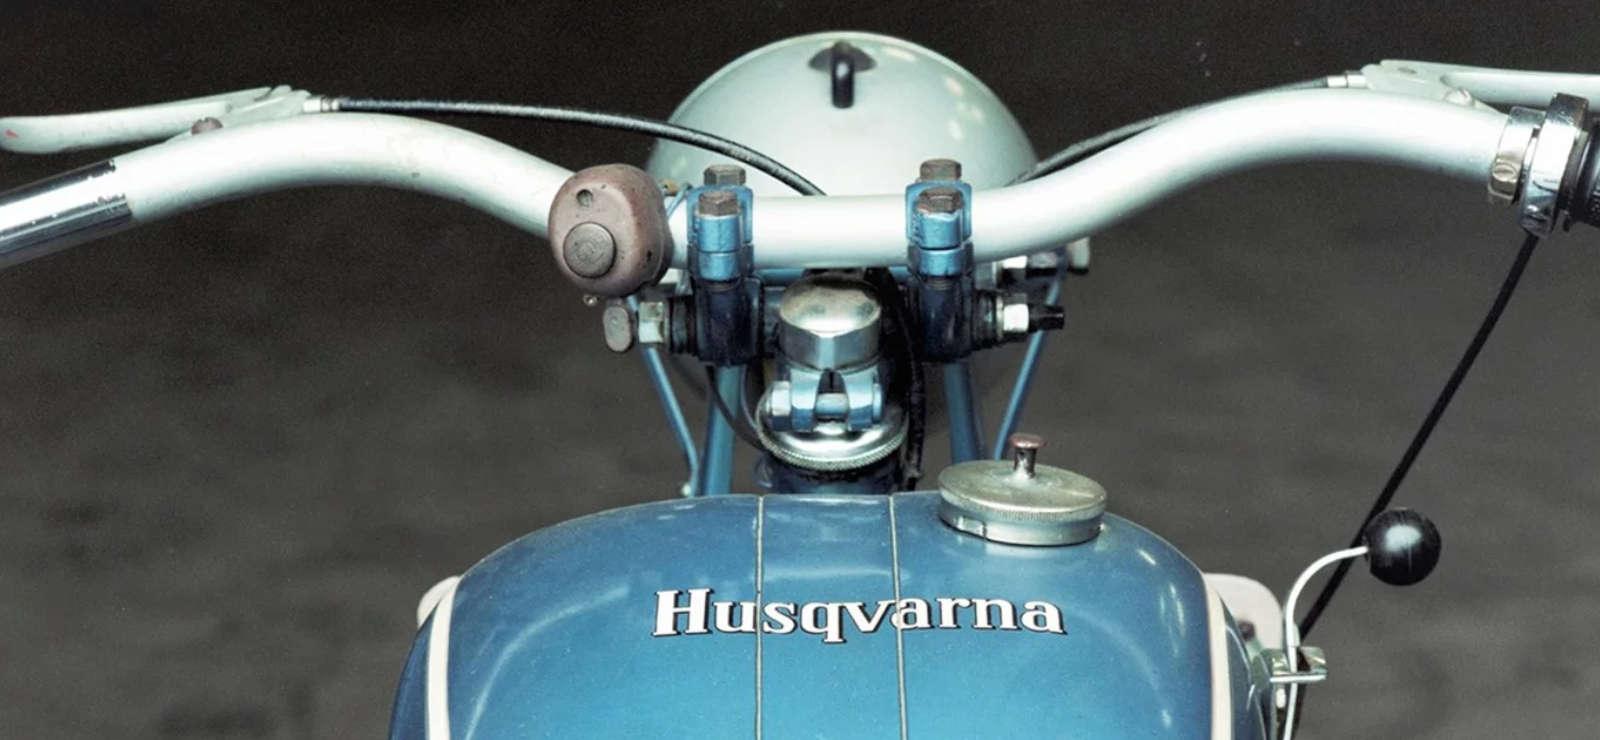 Husqvarna Banner